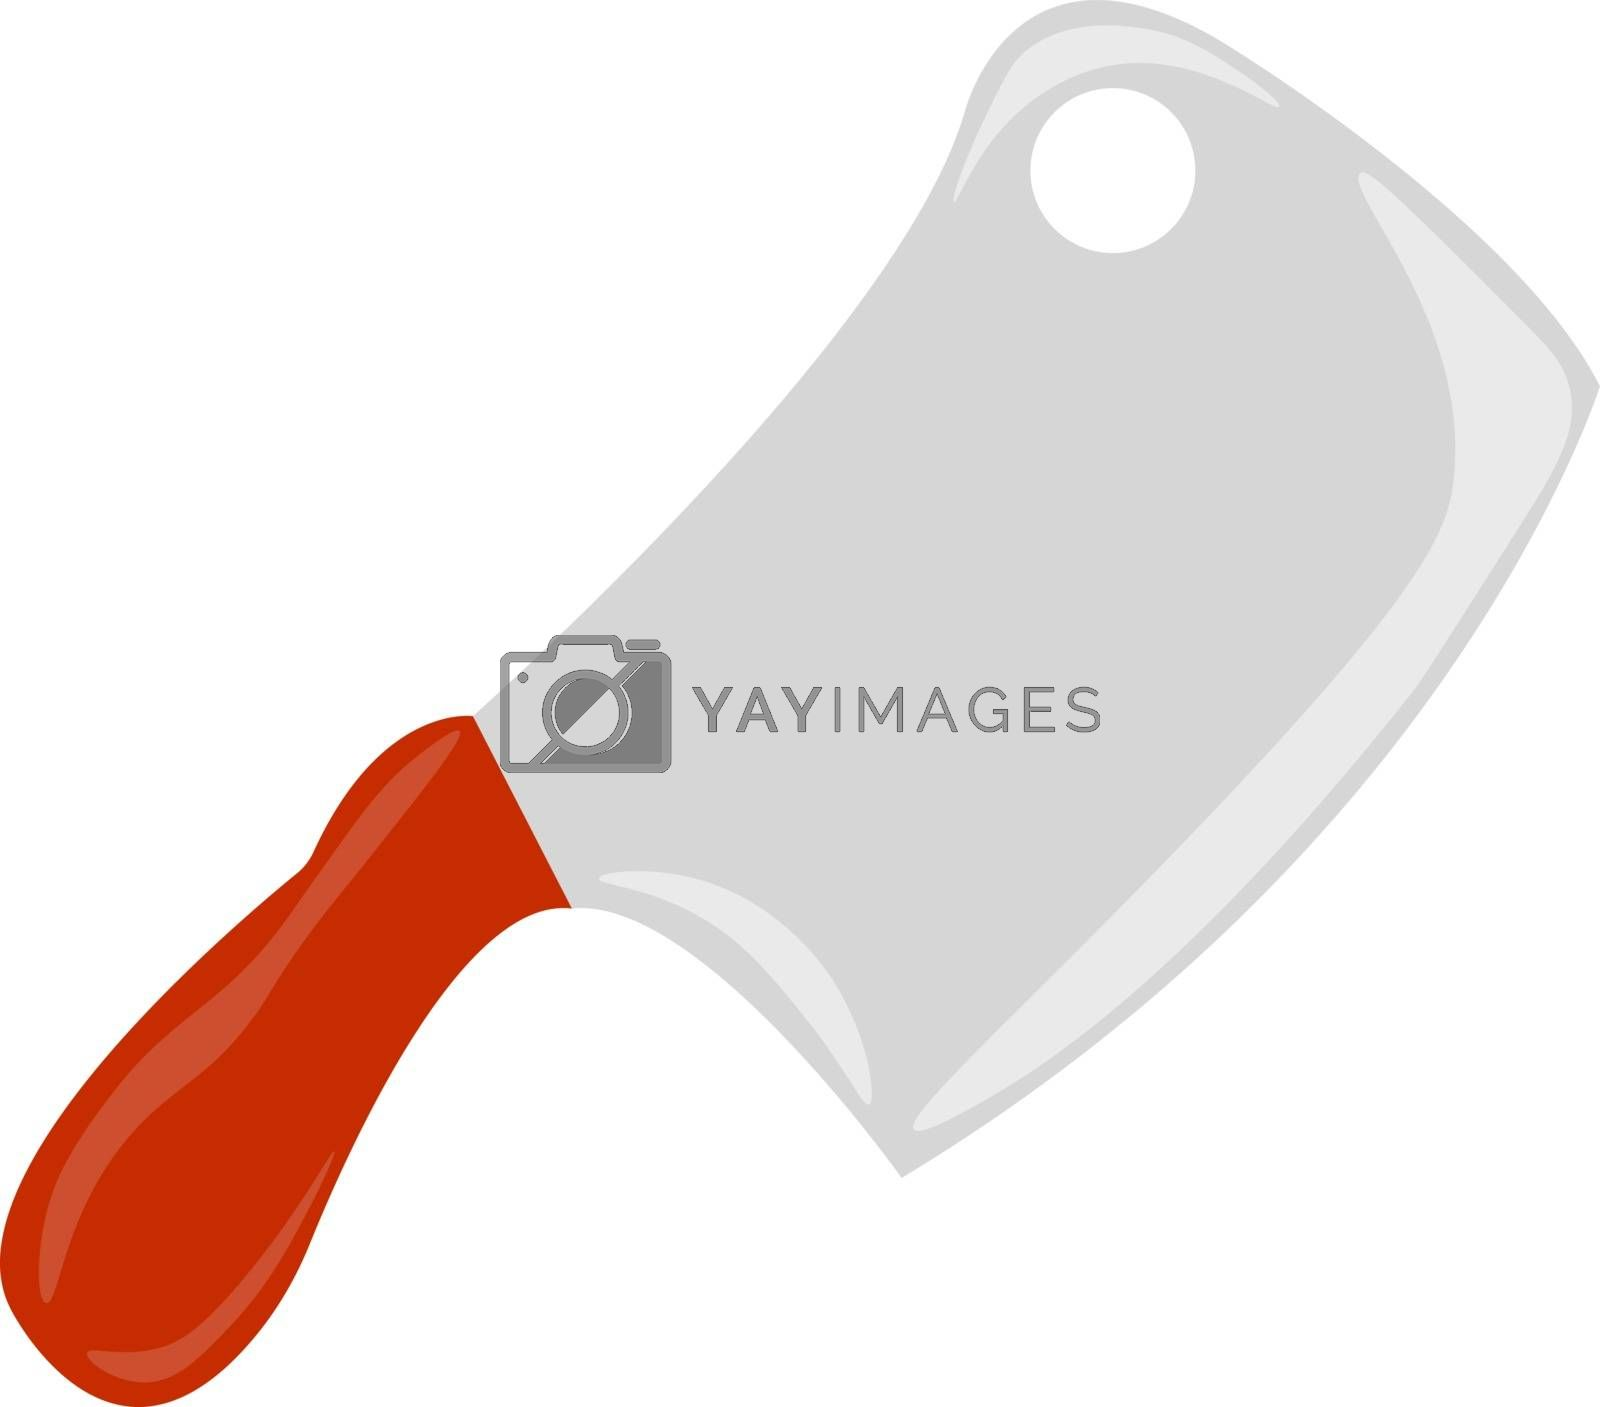 Kitchen knife, illustration, vector on white background.